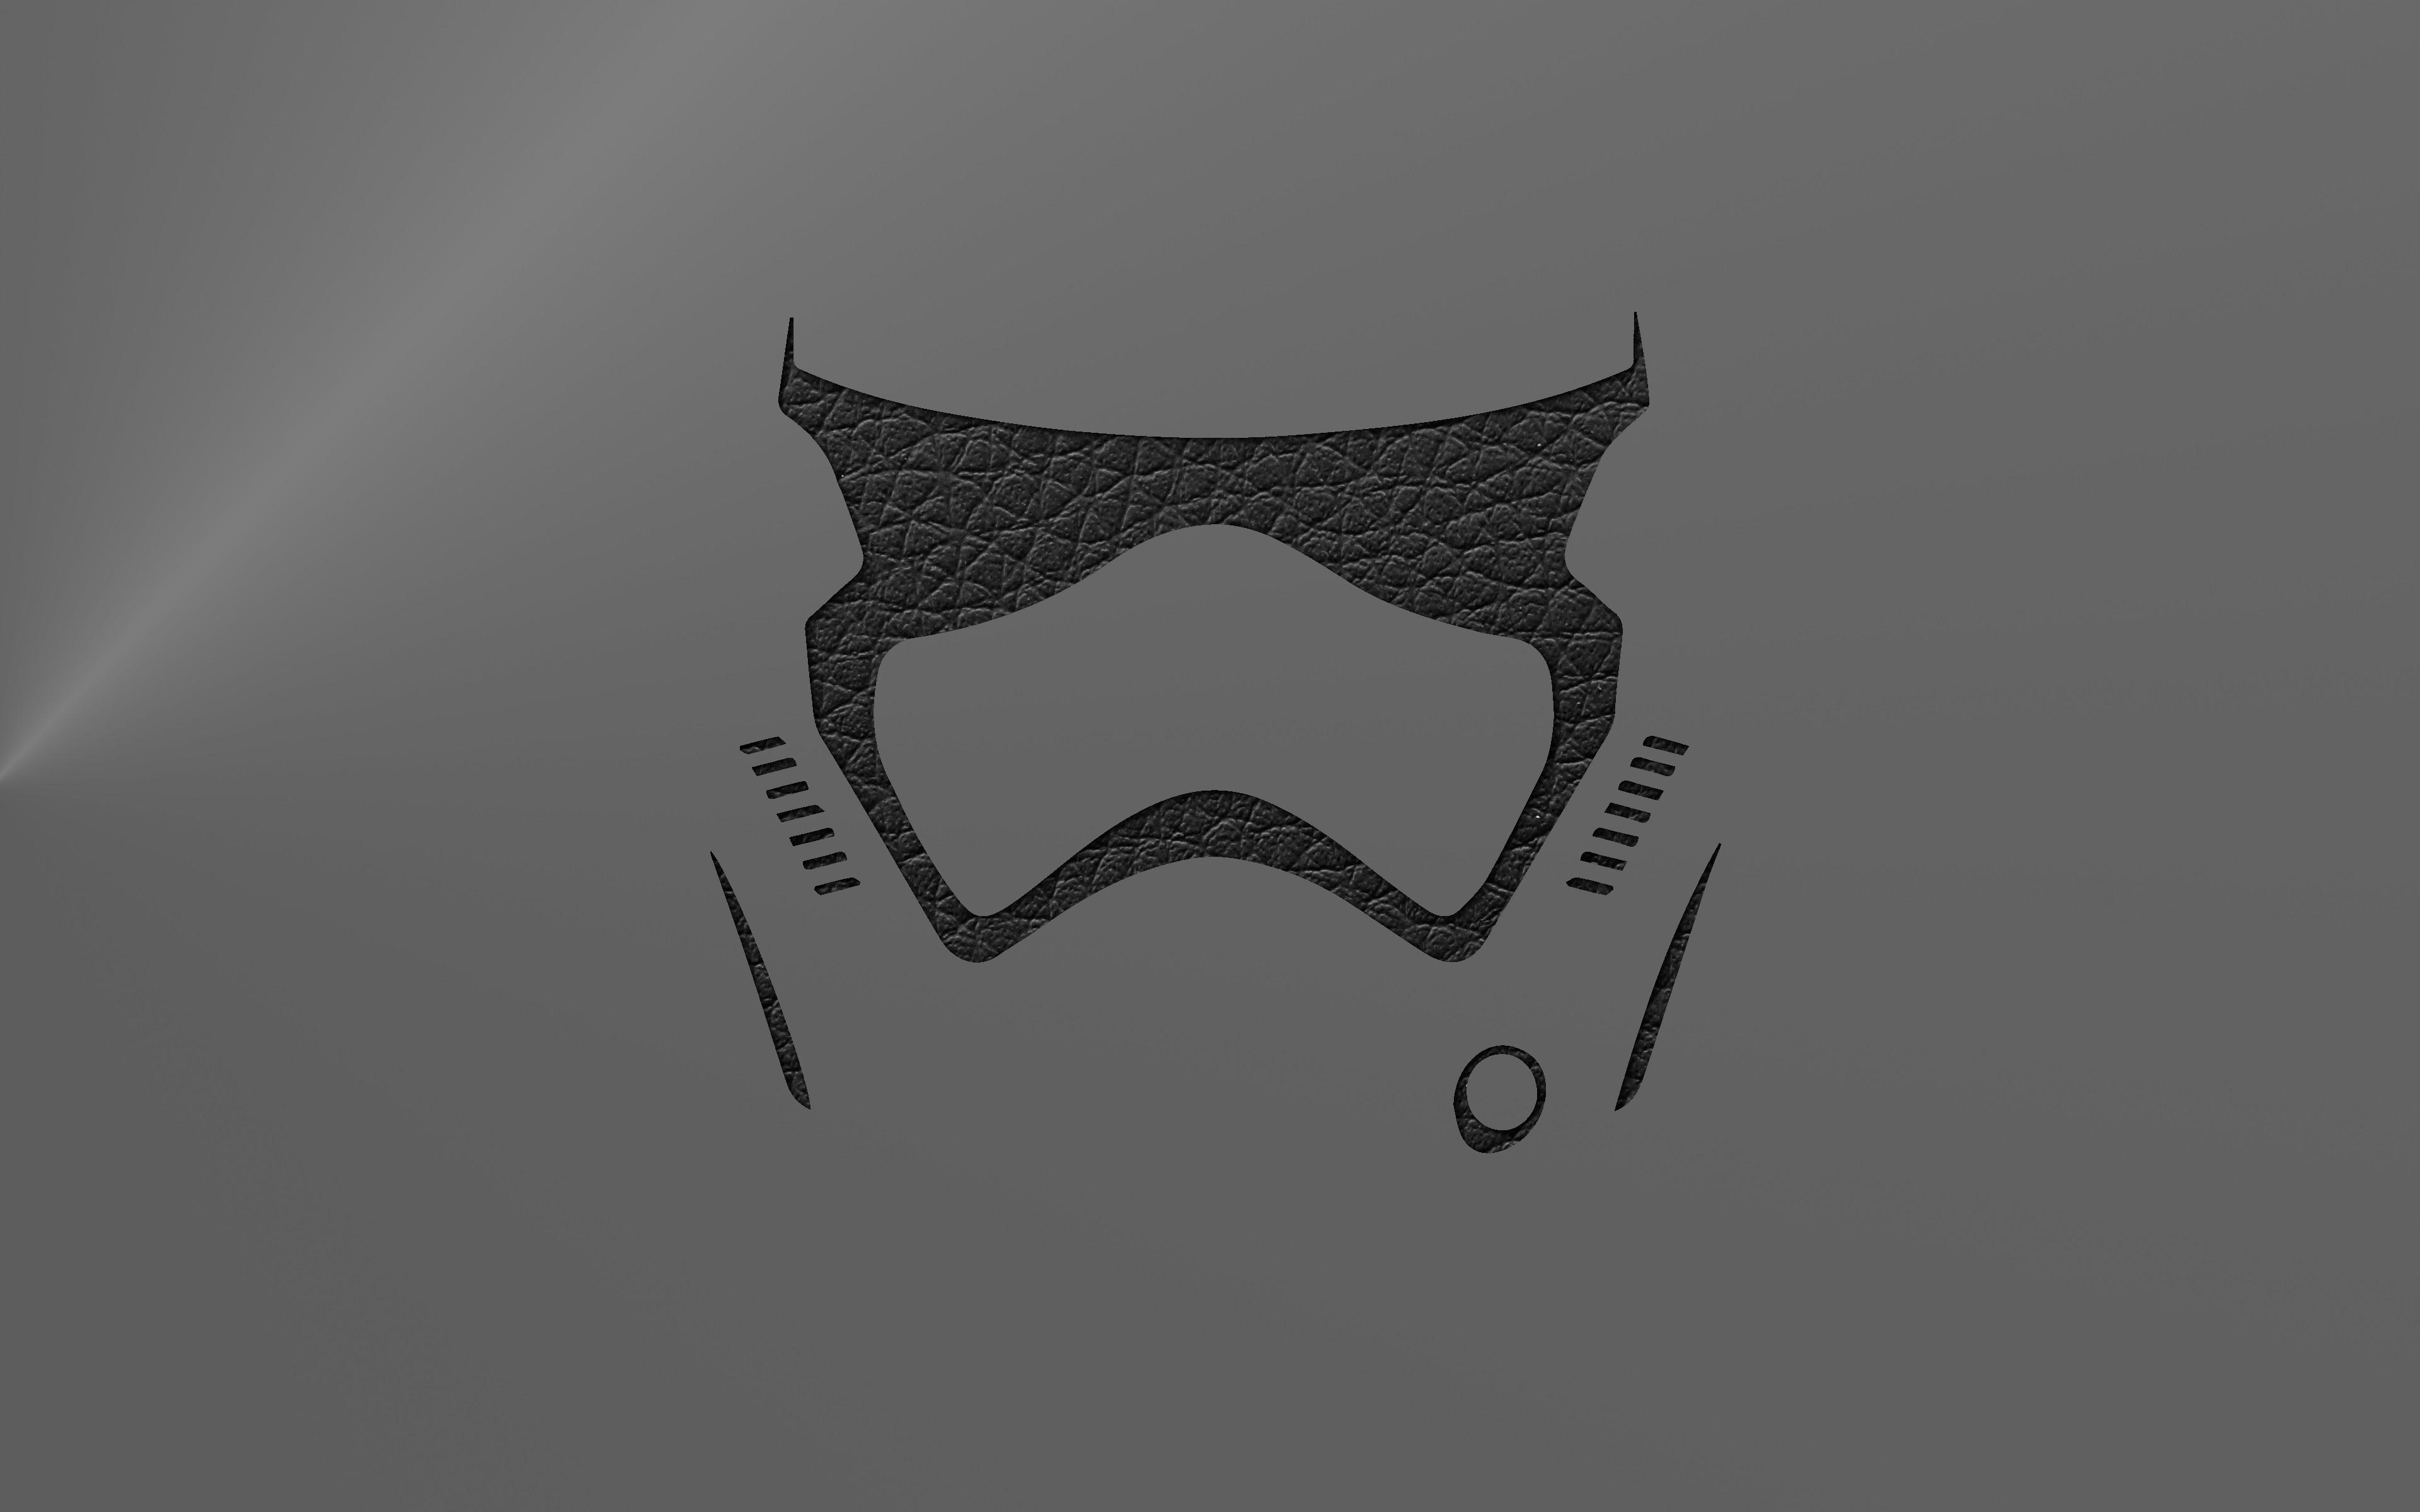 Wallpaper Drawing Black Illustration Star Wars Minimalism Glasses Shadow Logo Moustache Trooper Star Wars The Force Awakens Leather First Order Storm Troopers Head Bat Sketch Eyewear 3840x2400 Kejsirajbek 5149 Hd Wallpapers